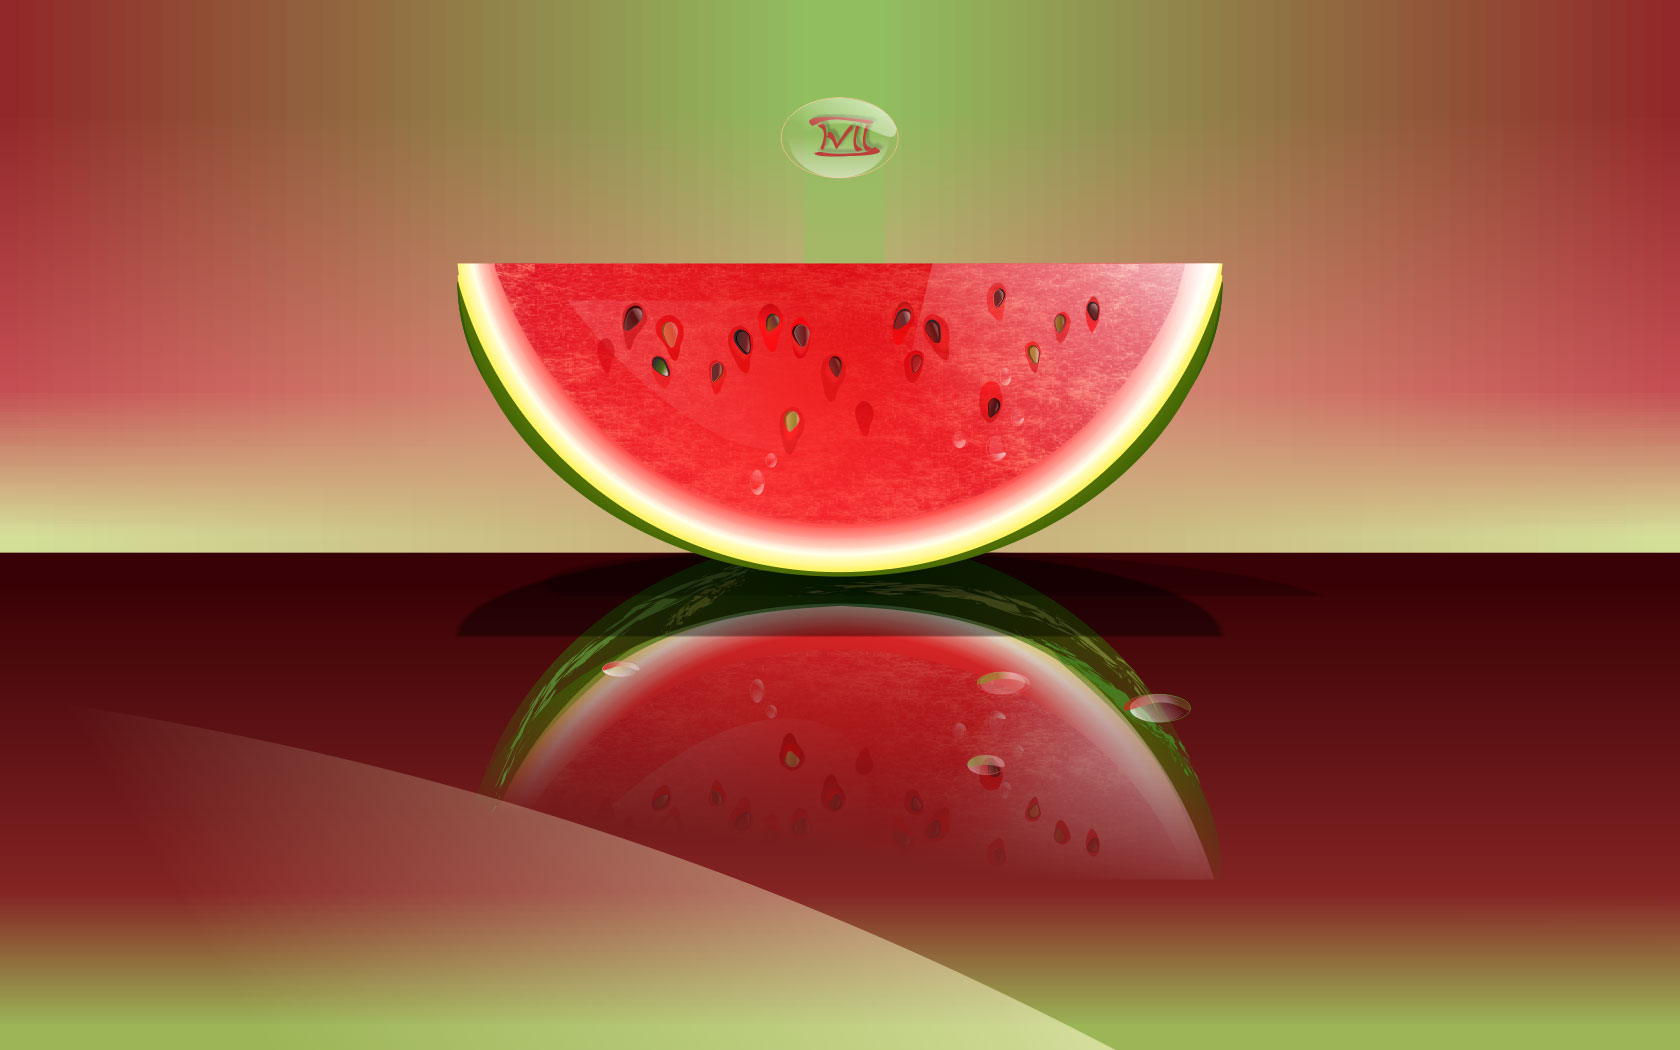 Watermelon widescreen for desktop